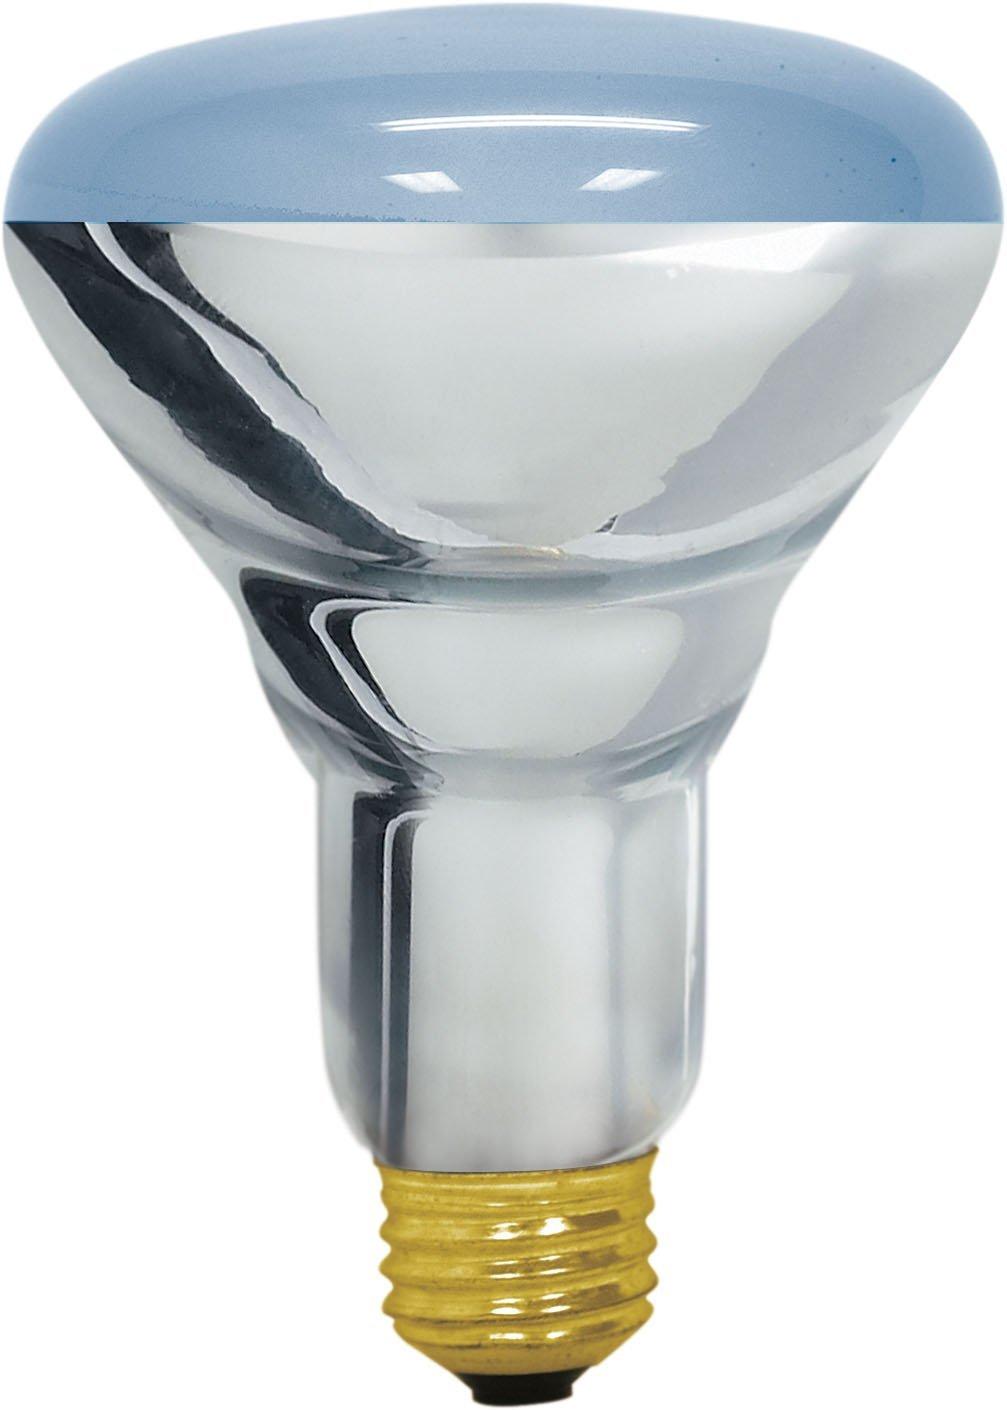 Ge 75414 Reveal Long Life Halogen Indoor Flood, 65 Watt (Pack Of 6) by GE Lighting